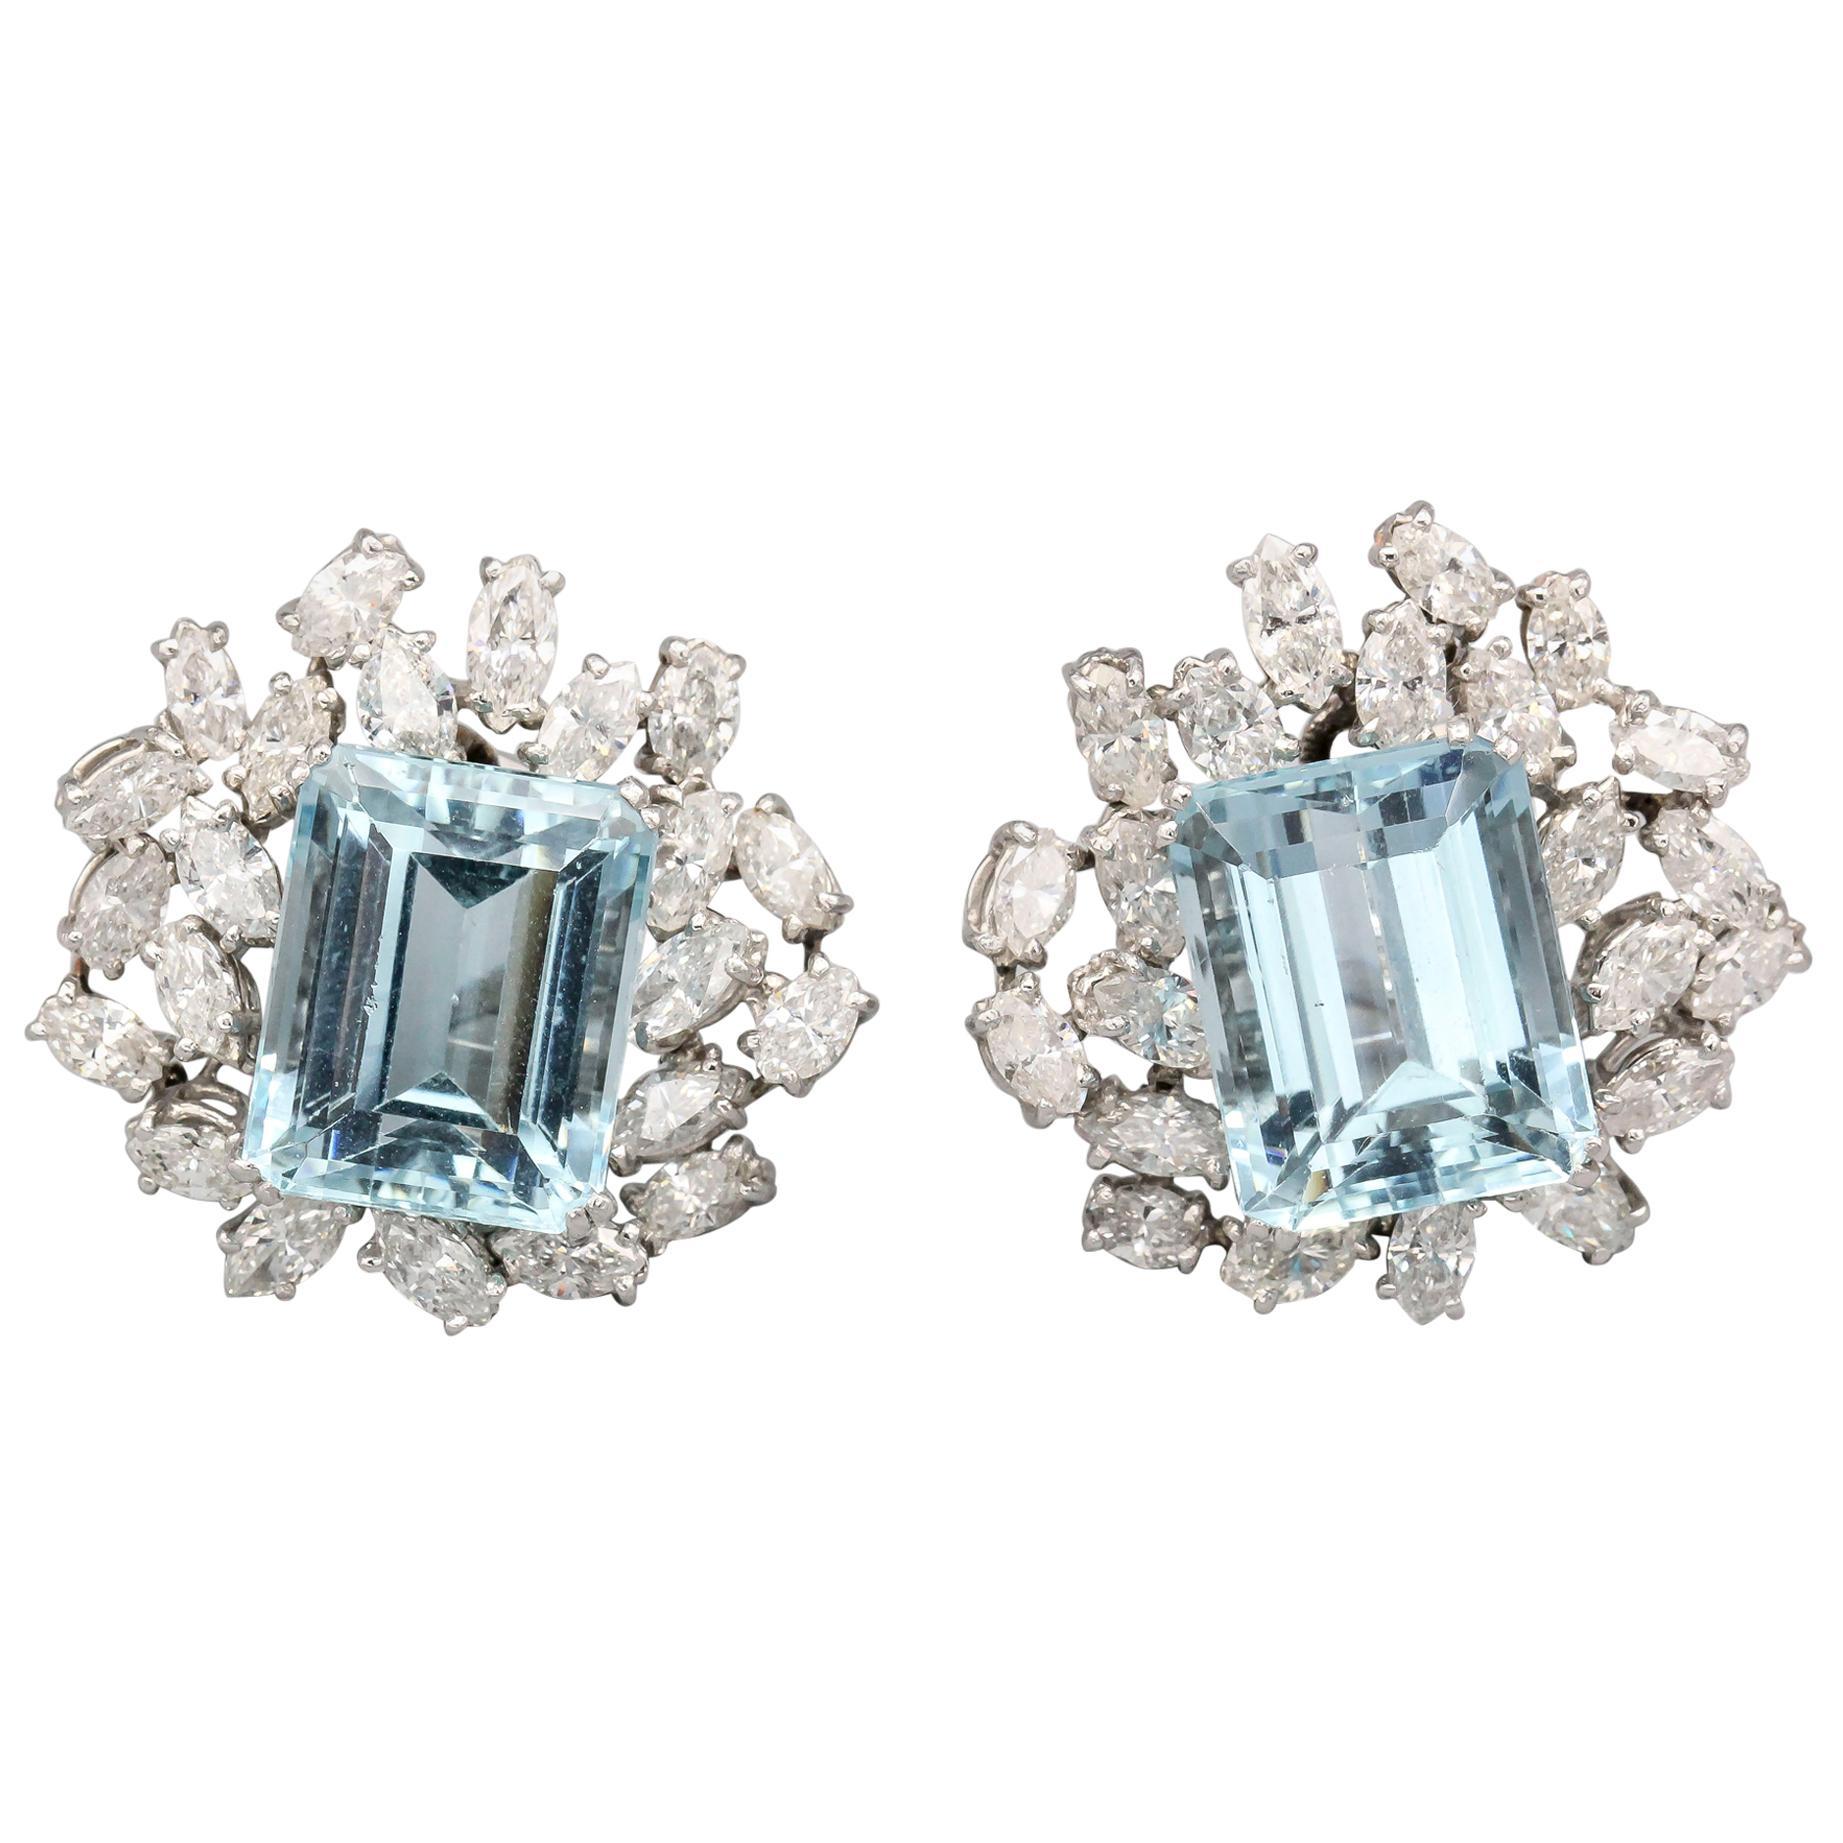 Boucheron Aquamarine Diamond and Platinum Earrings